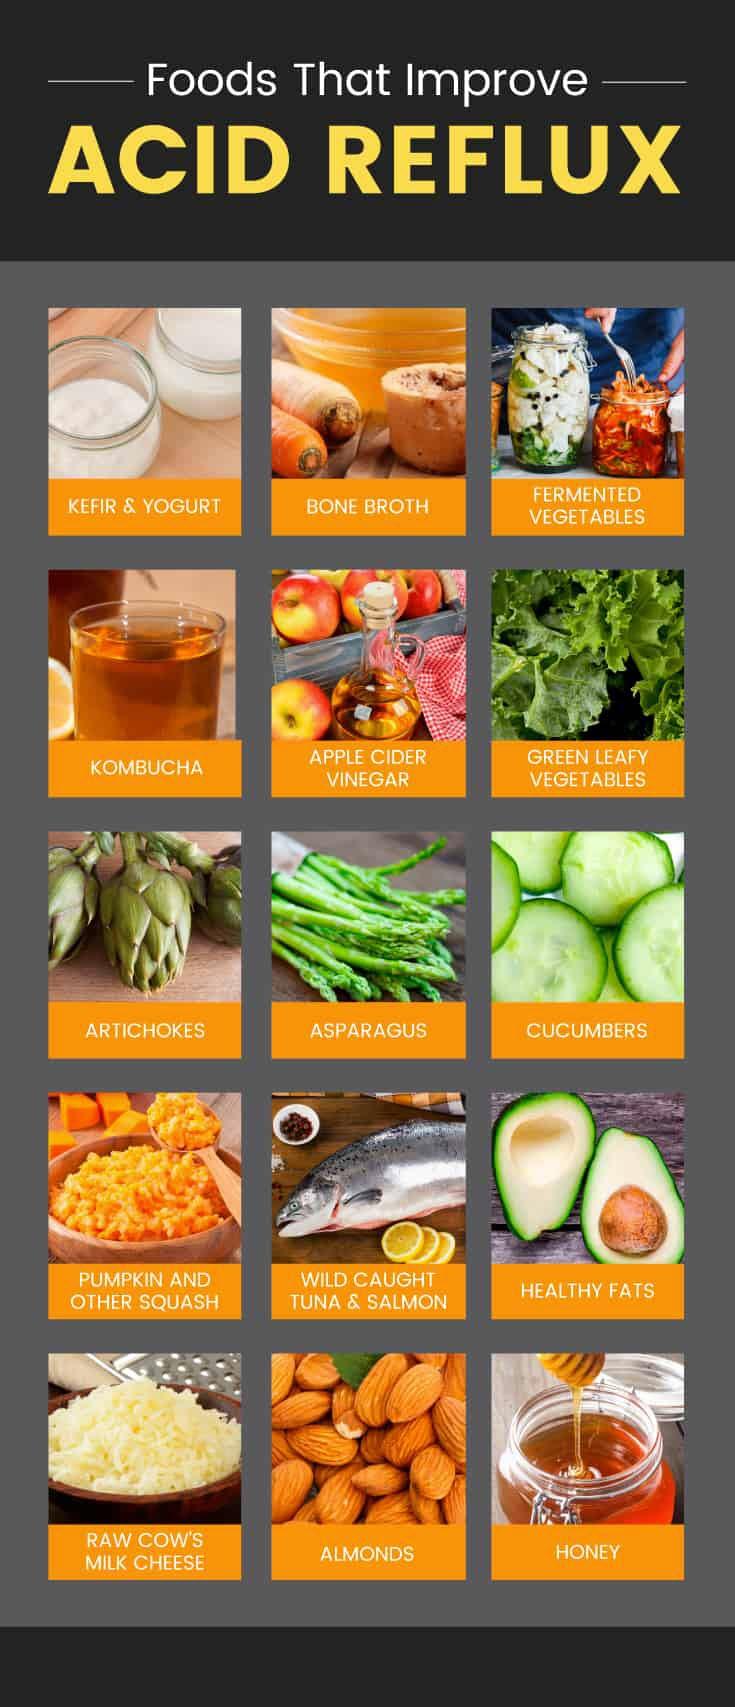 Foods that improve acid reflux symptoms